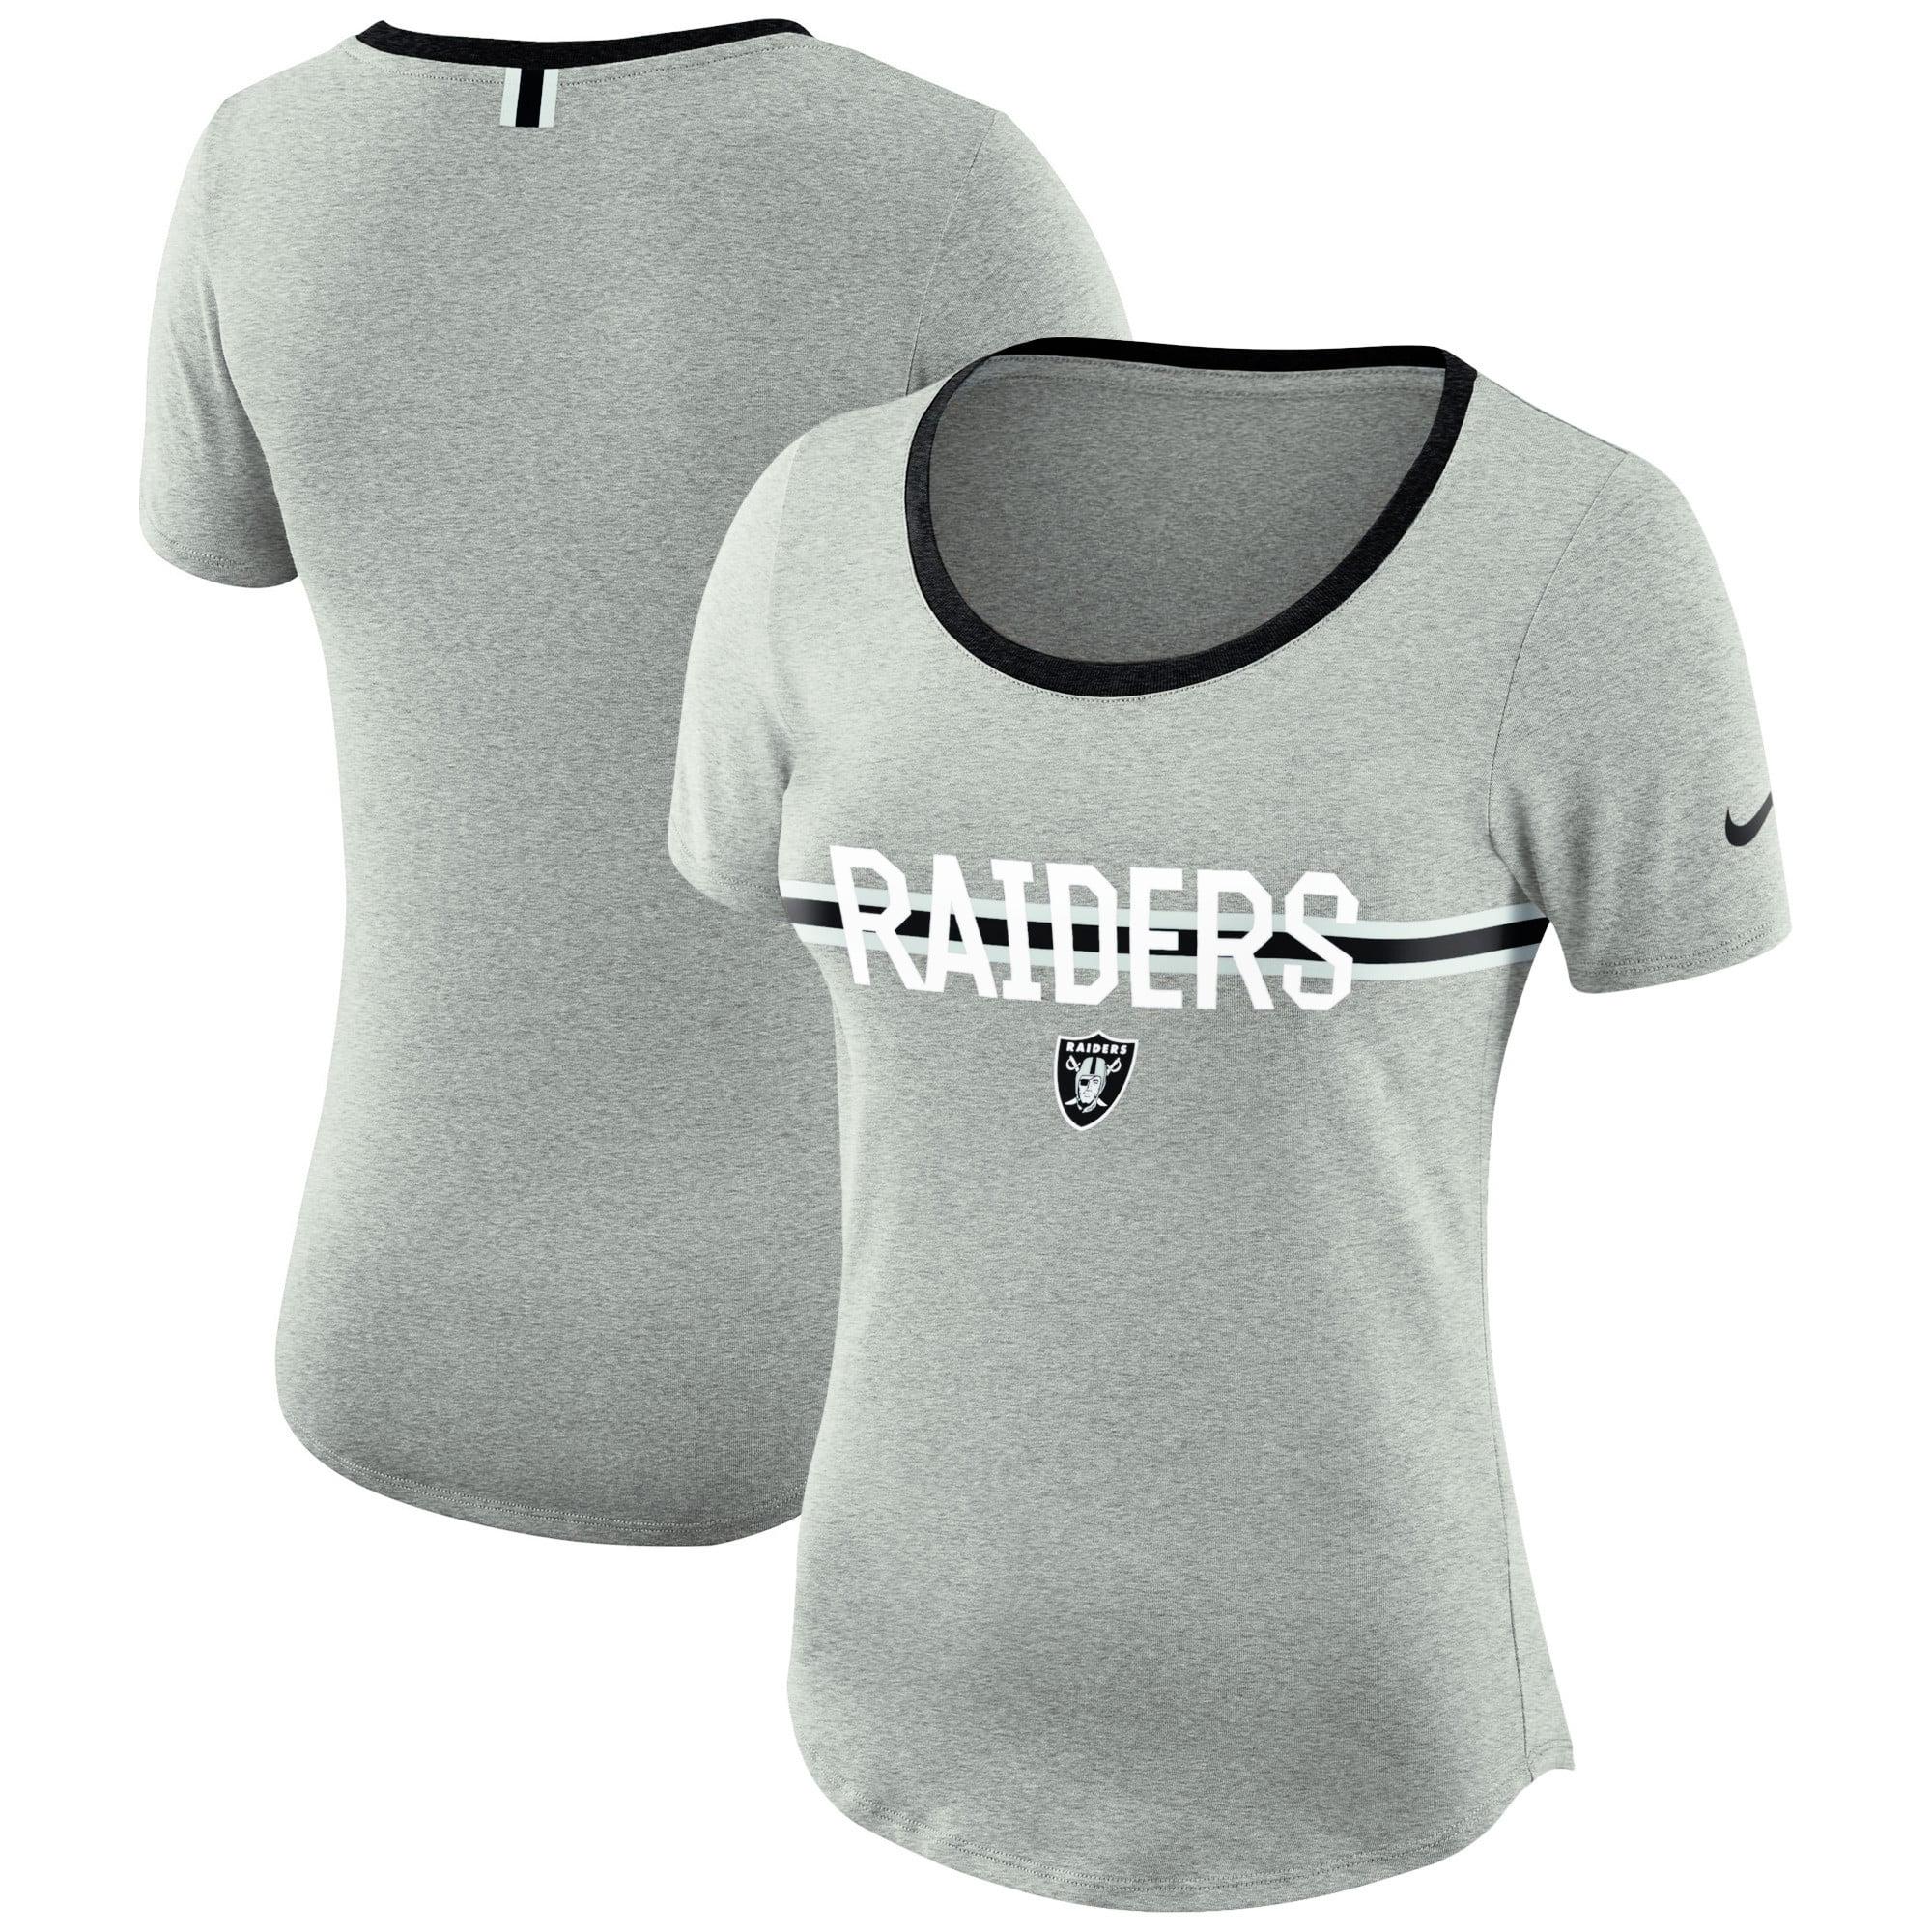 Oakland Raiders Nike Women's Strike Slub T-Shirt - Heathered Gray